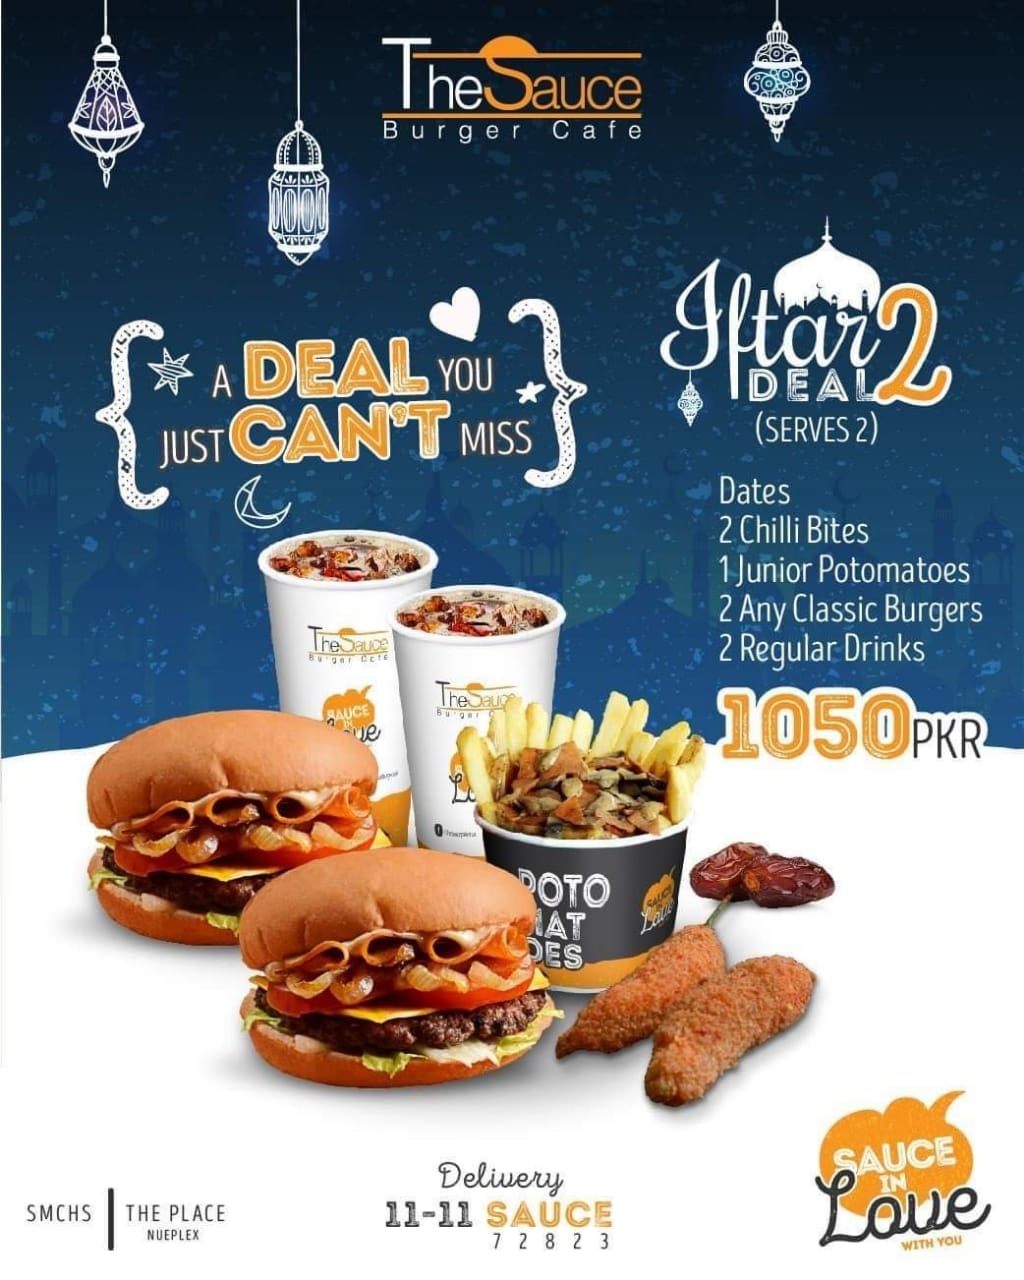 the sauce - ramzan deals and discounts in Karachi 2019